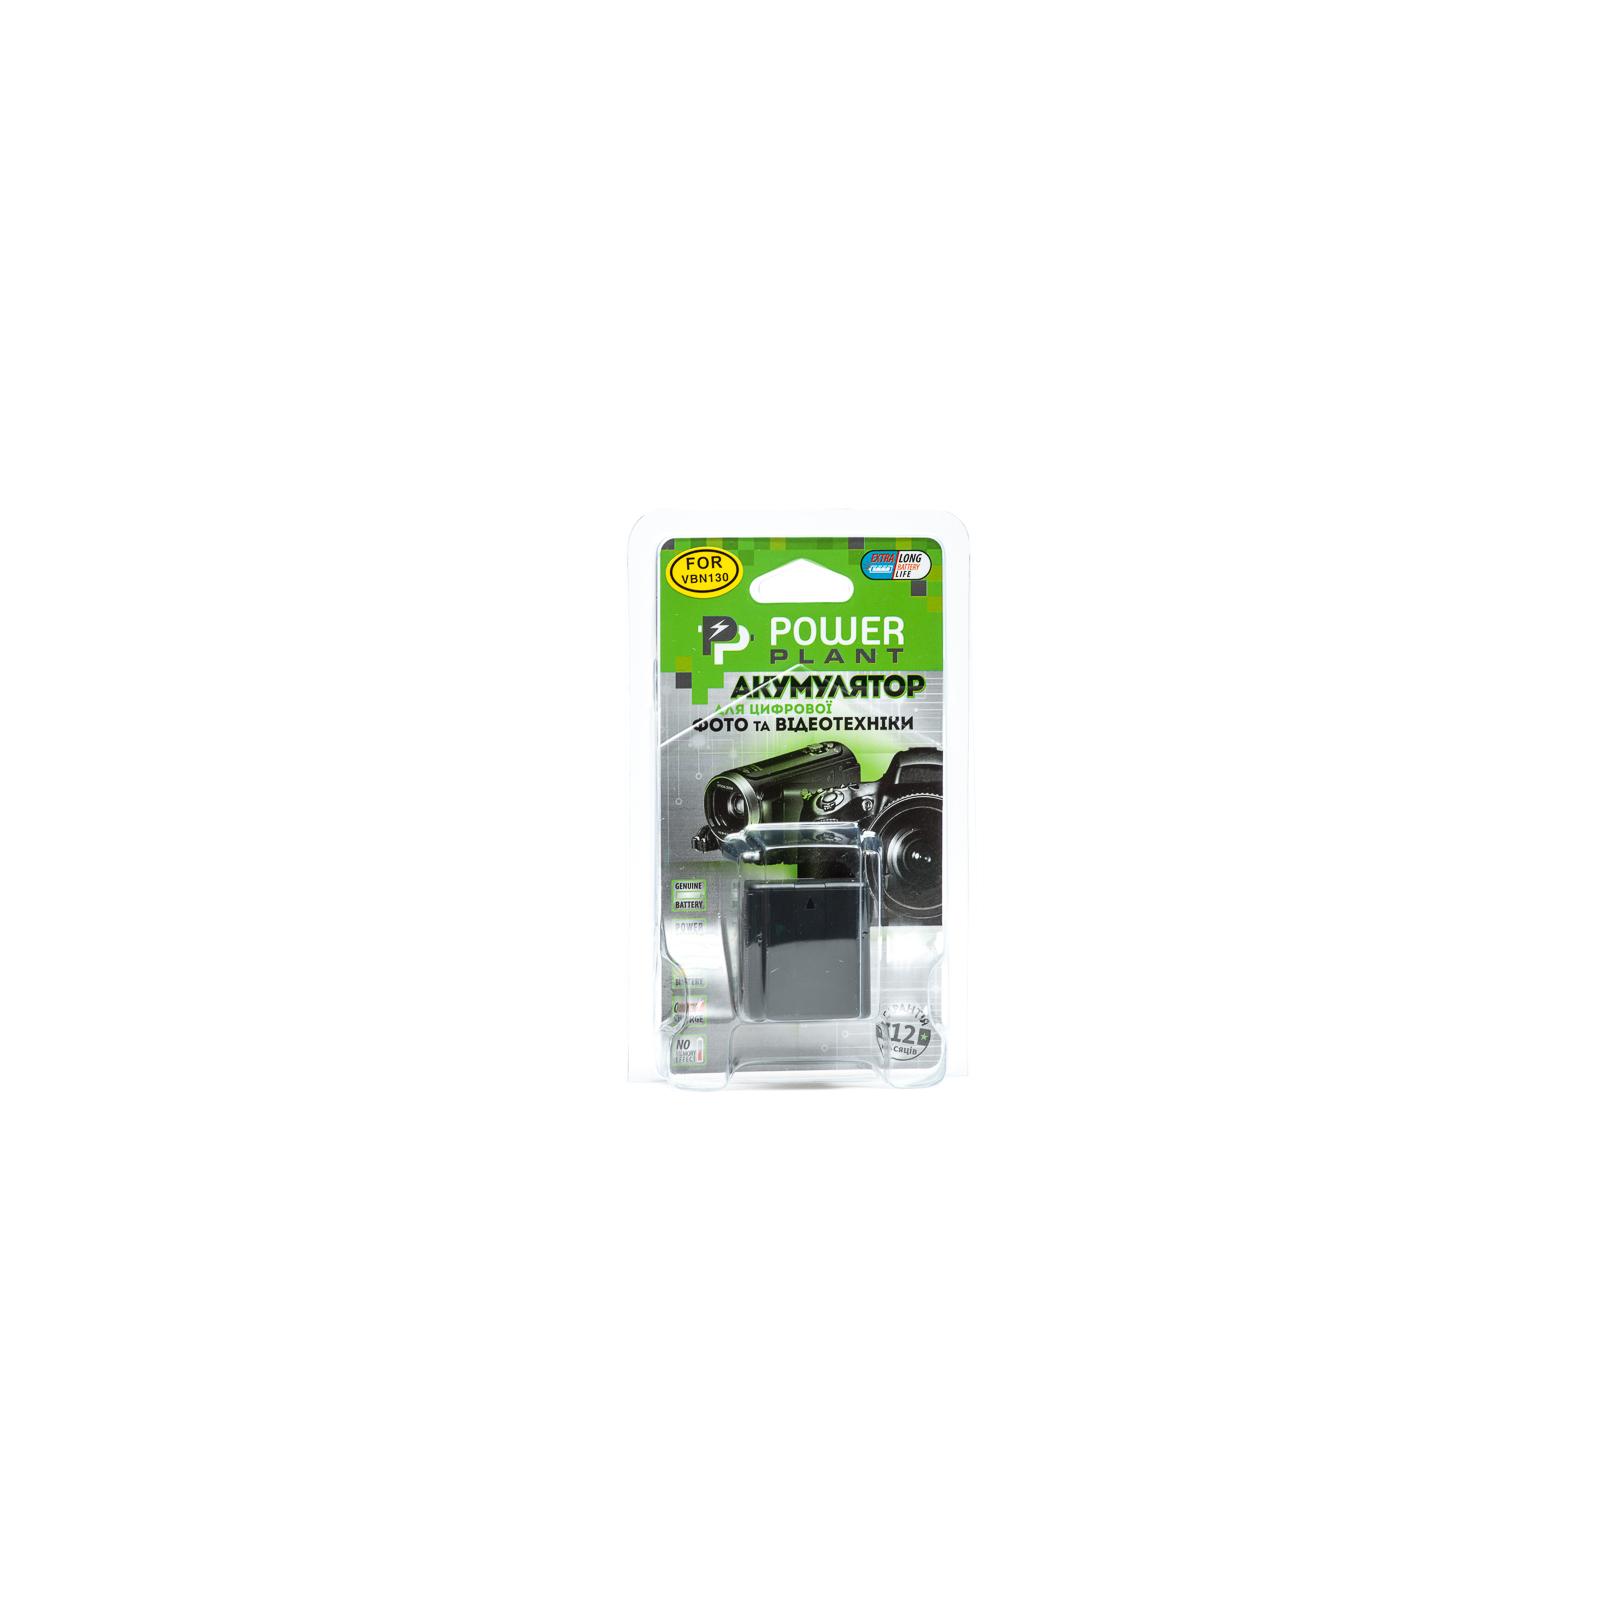 Аккумулятор к фото/видео PowerPlant Panasonic VW-VBN130 (DV00DV1295) изображение 3